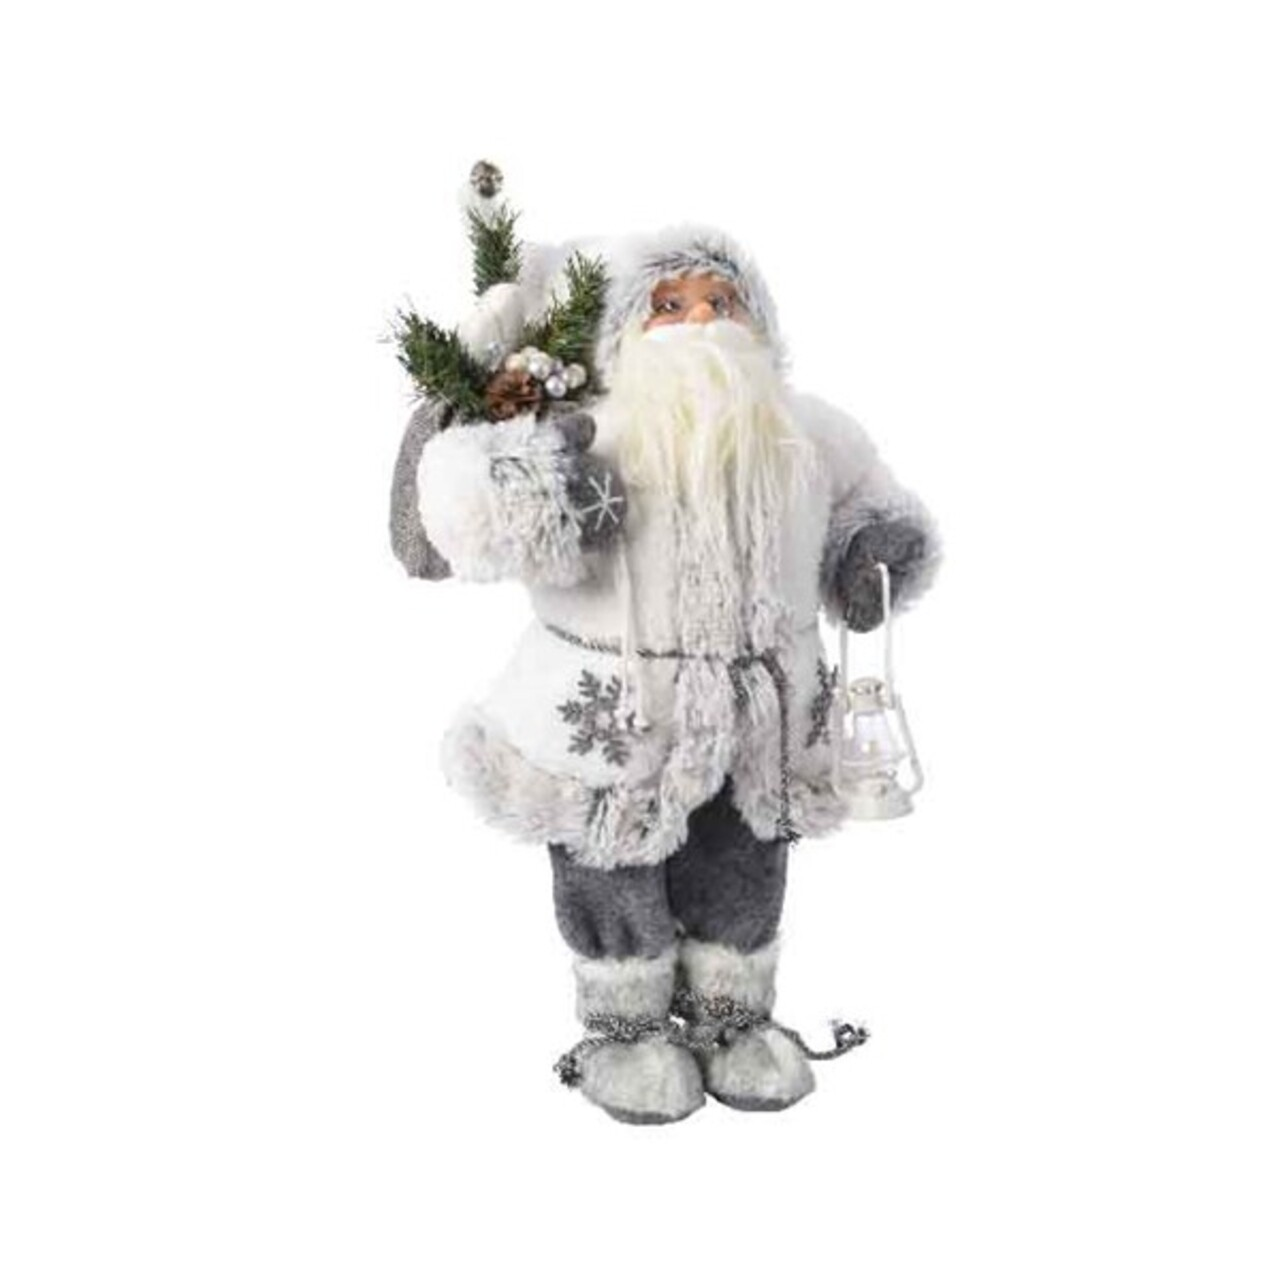 Decoratiune Santa w snowflake, Decoris, H45 cm, poliester, alb